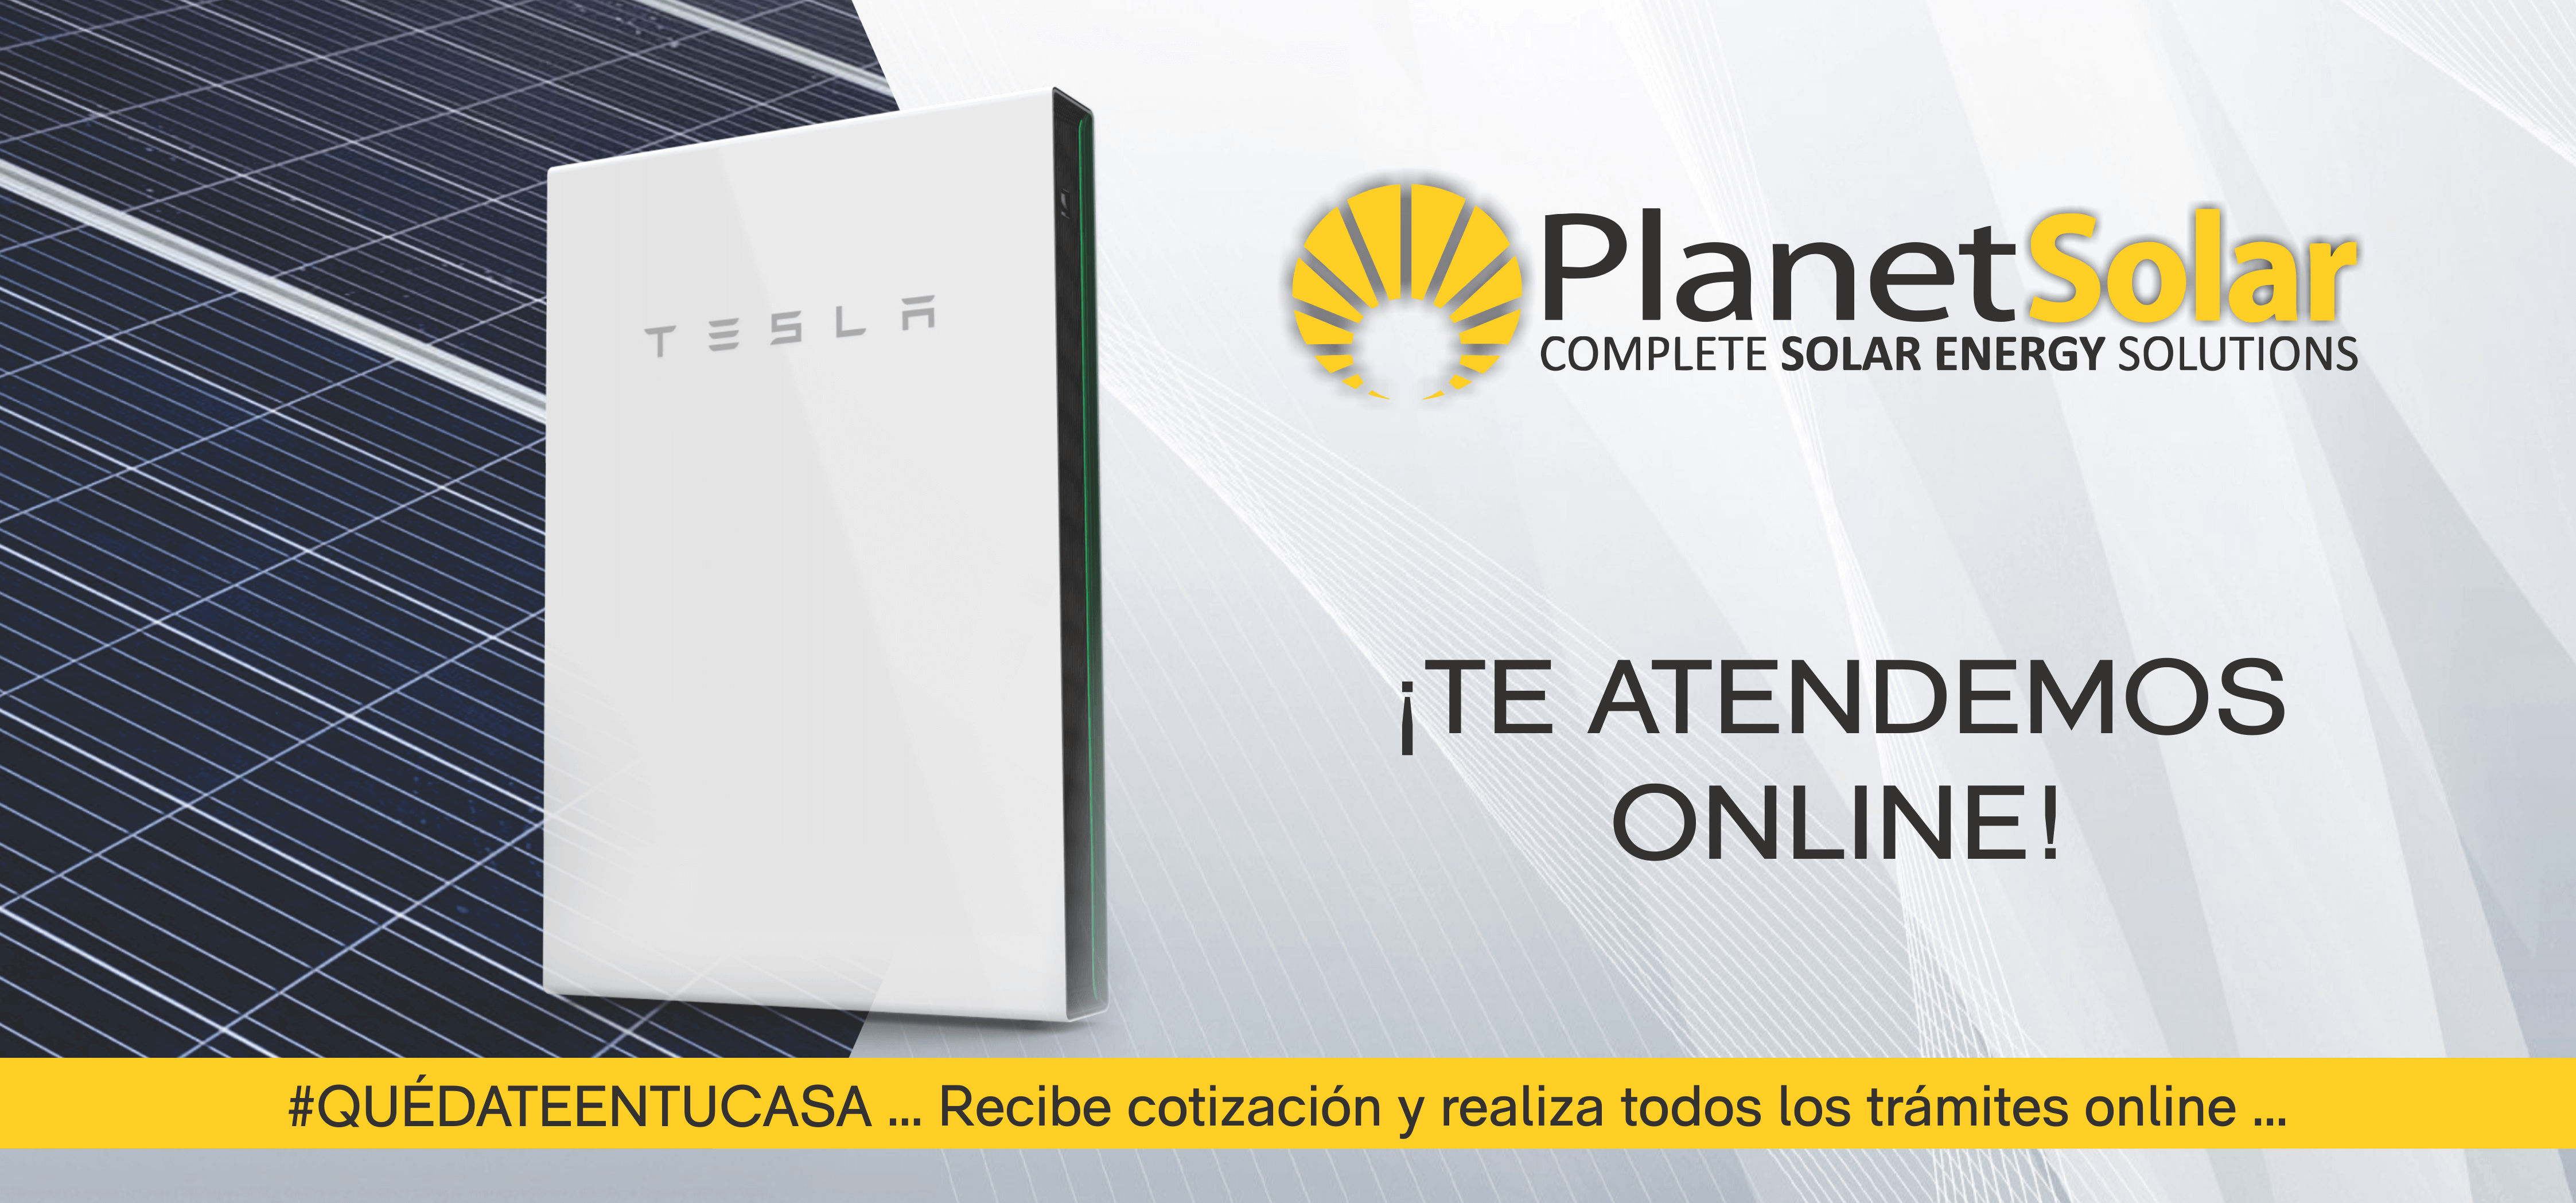 PlanetSolar - Te atendemos online